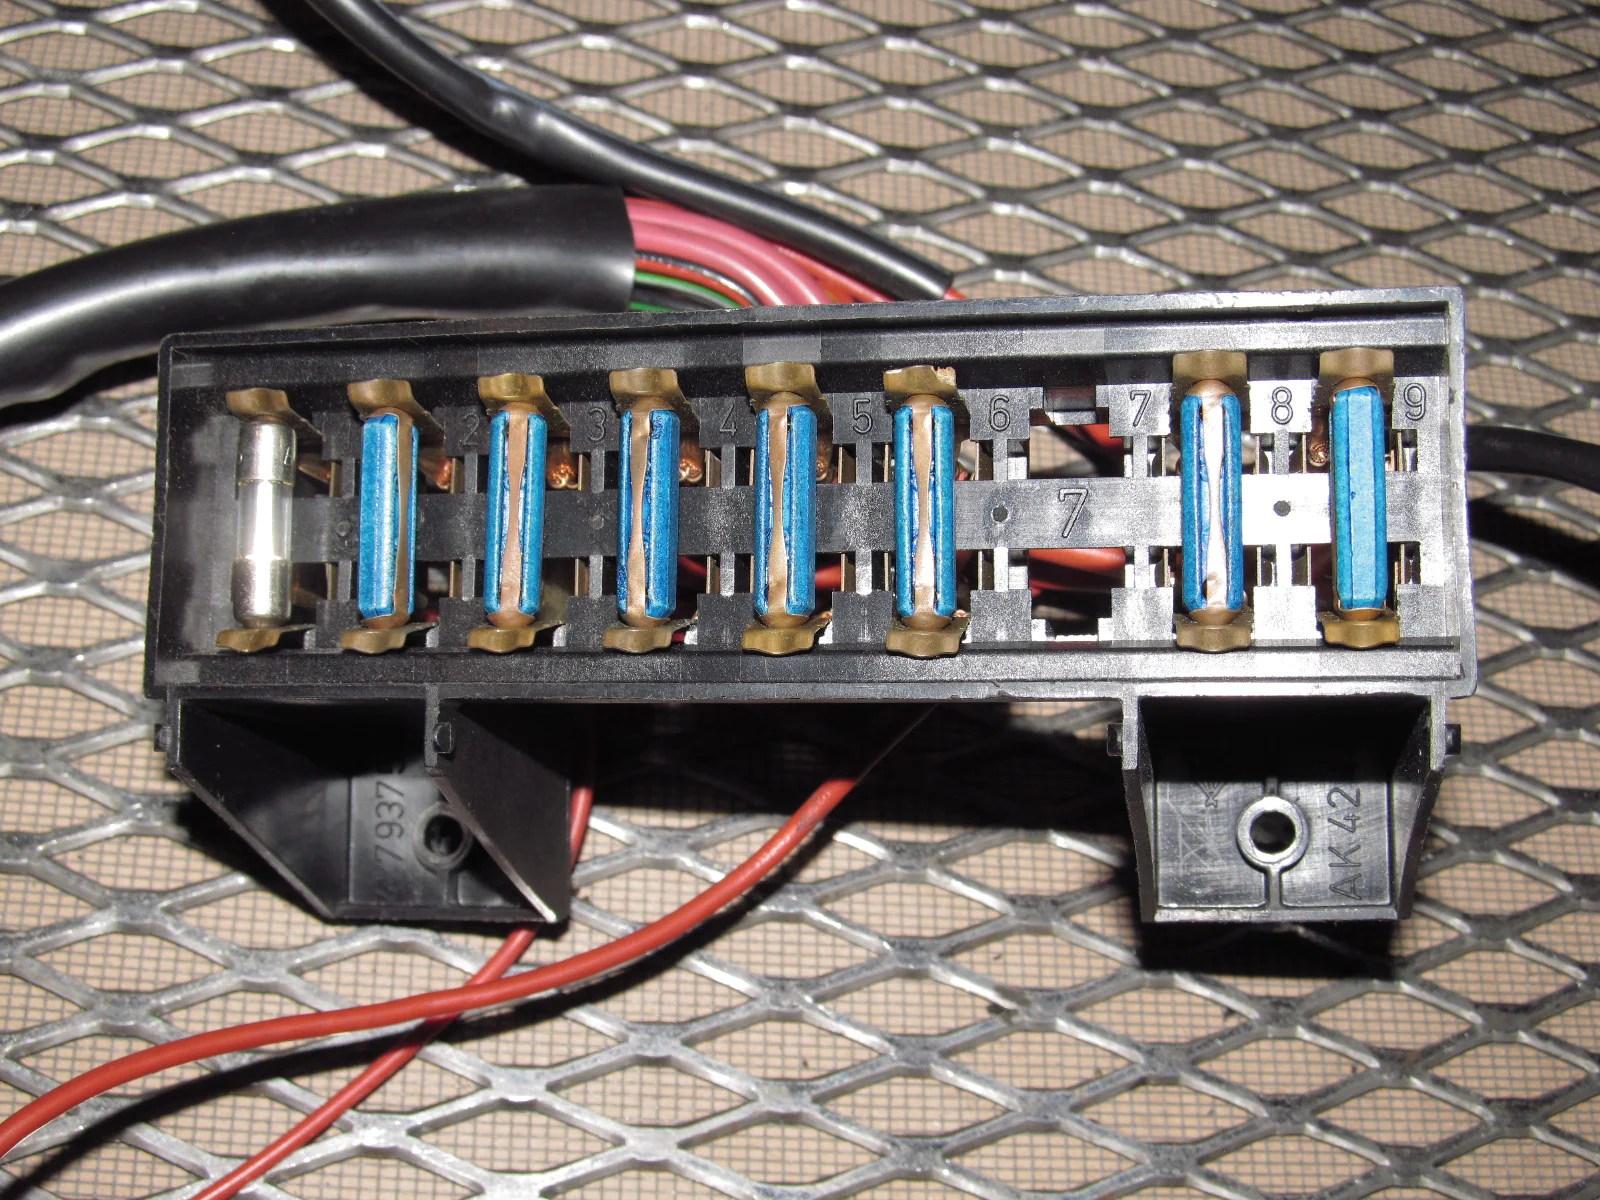 83 85 porsche 944 oem interior fuse box  [ 1600 x 1200 Pixel ]